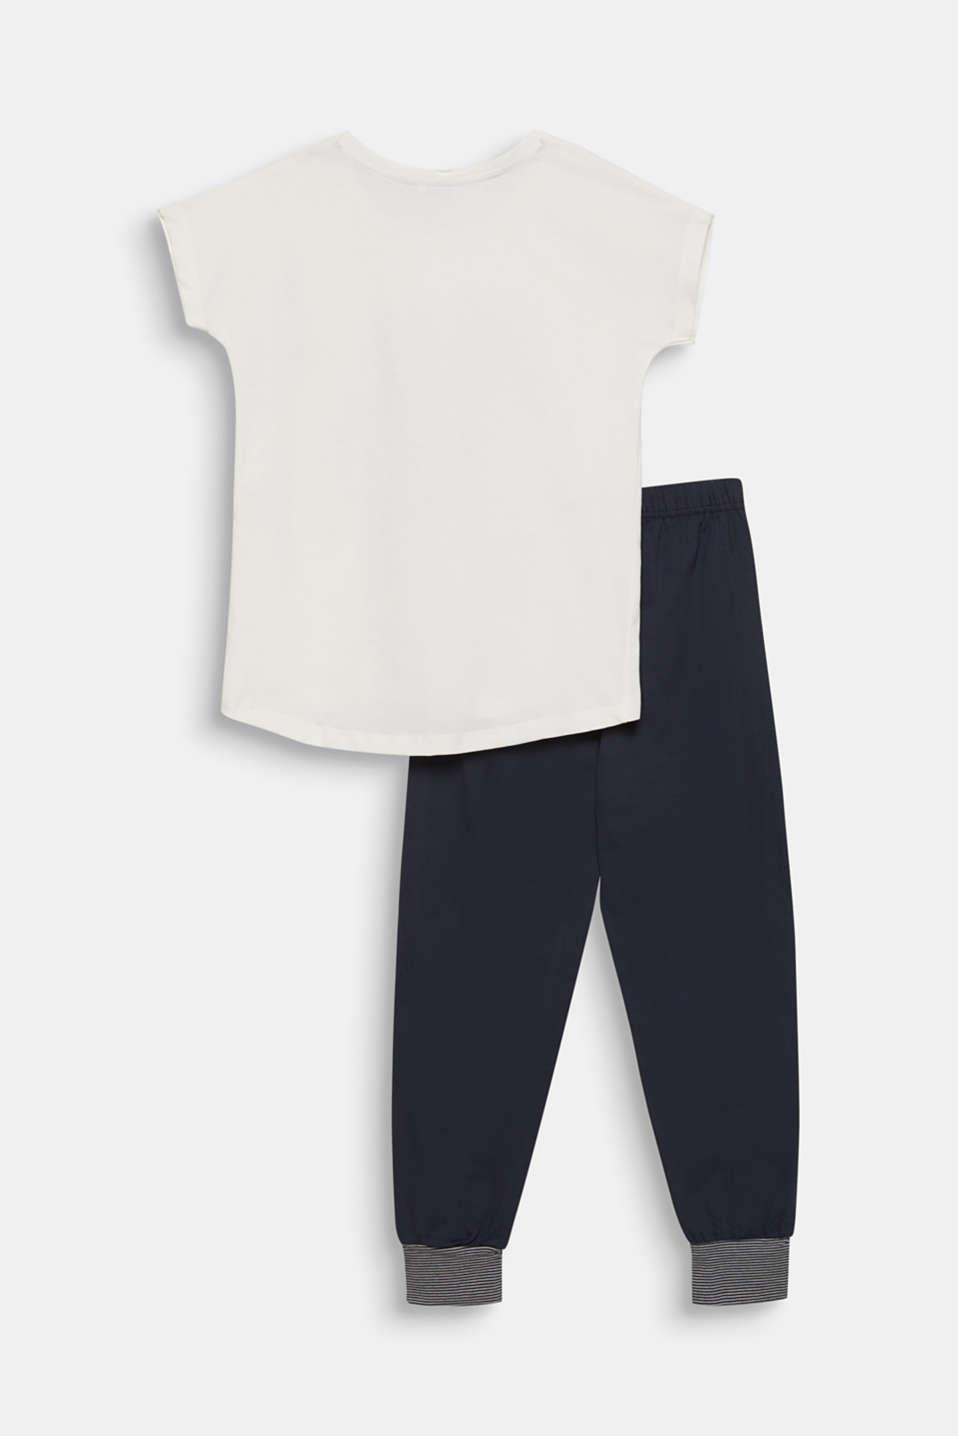 Pyjamas with a printed motif, 100% cotton, NAVY 2, detail image number 1